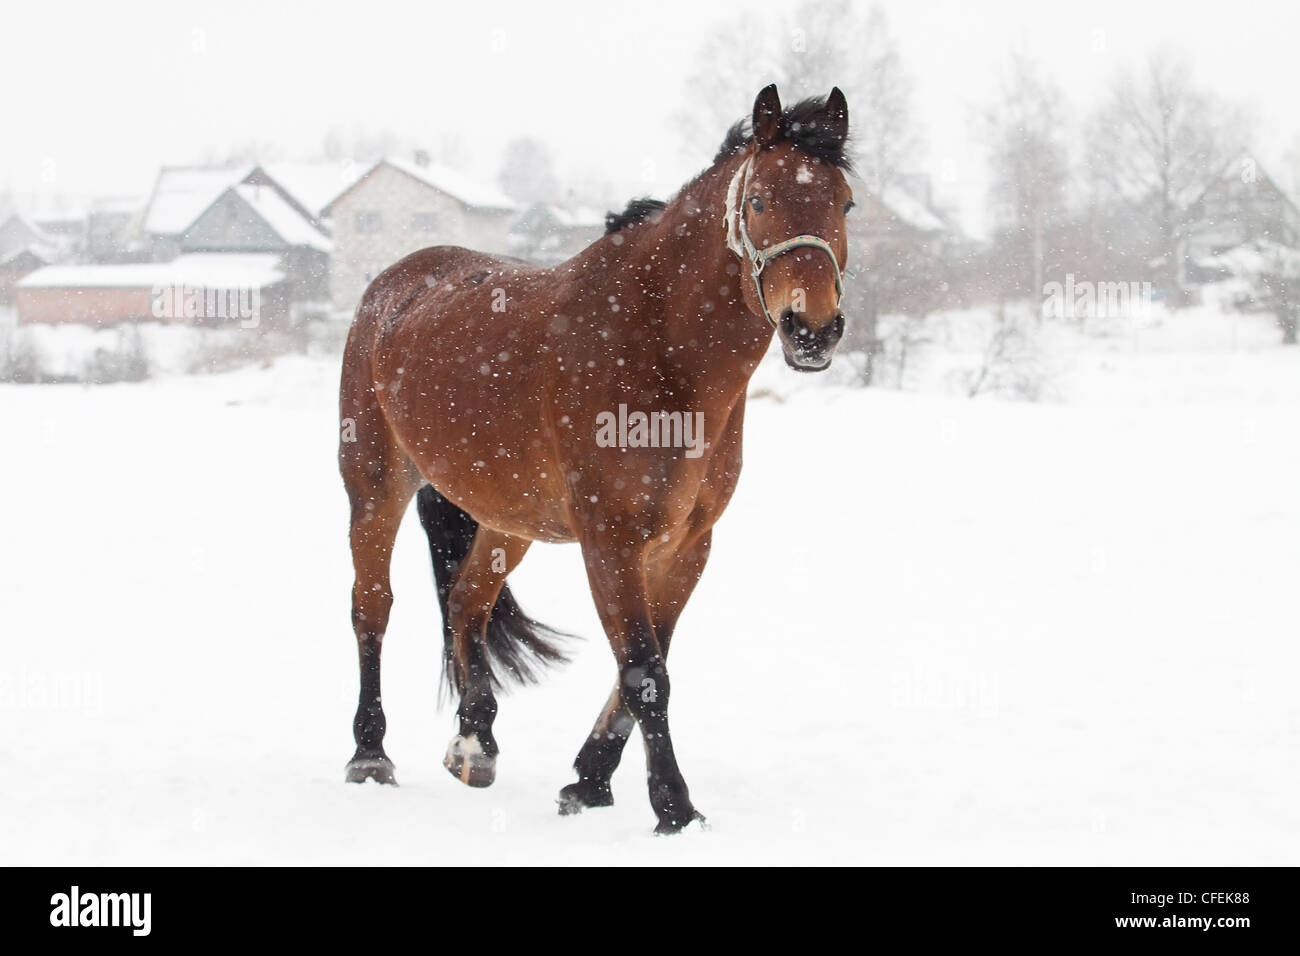 Dark bay horse on snowy meadow - Stock Image